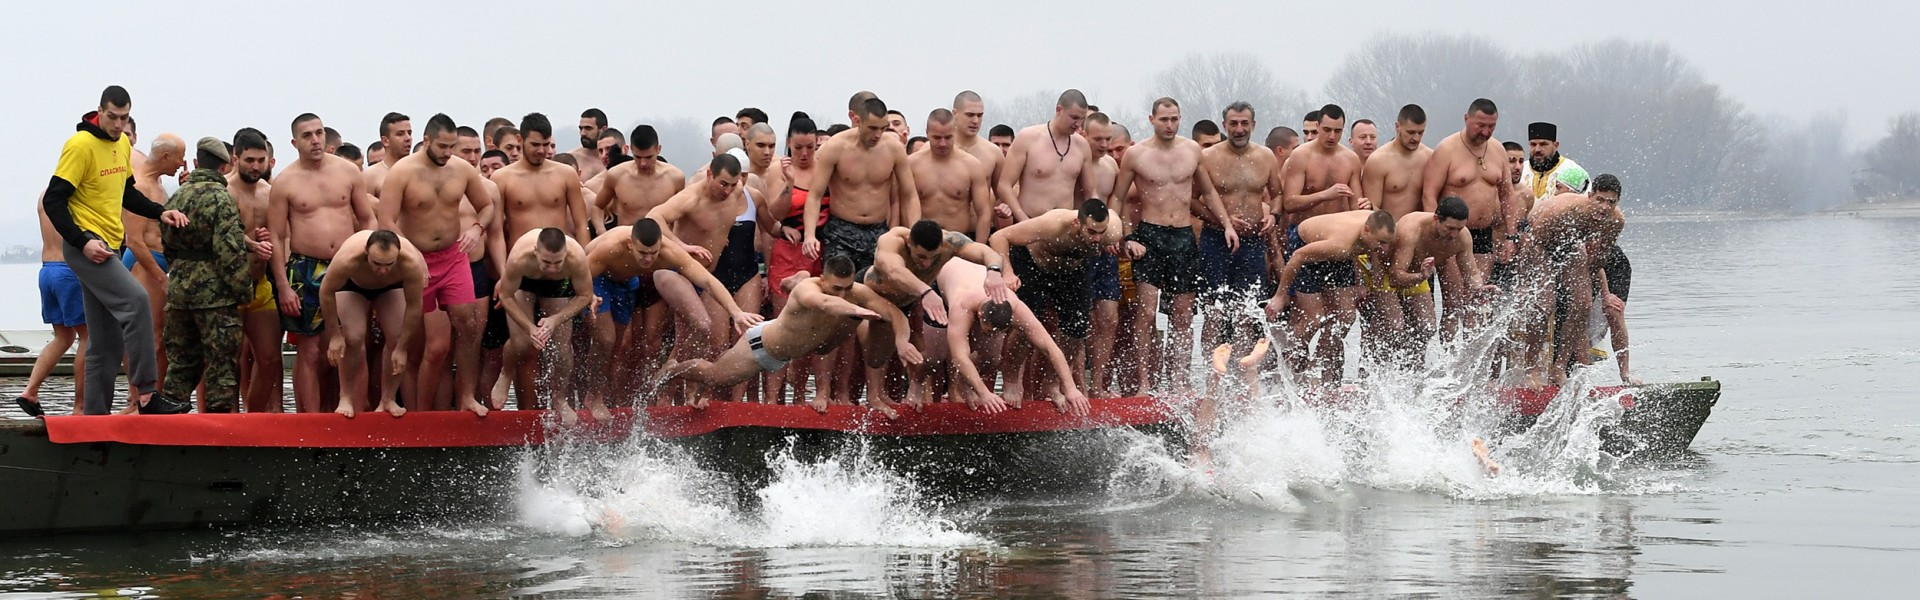 Pripadnici Vojske Srbije plivali za Časni krst širom Srbije